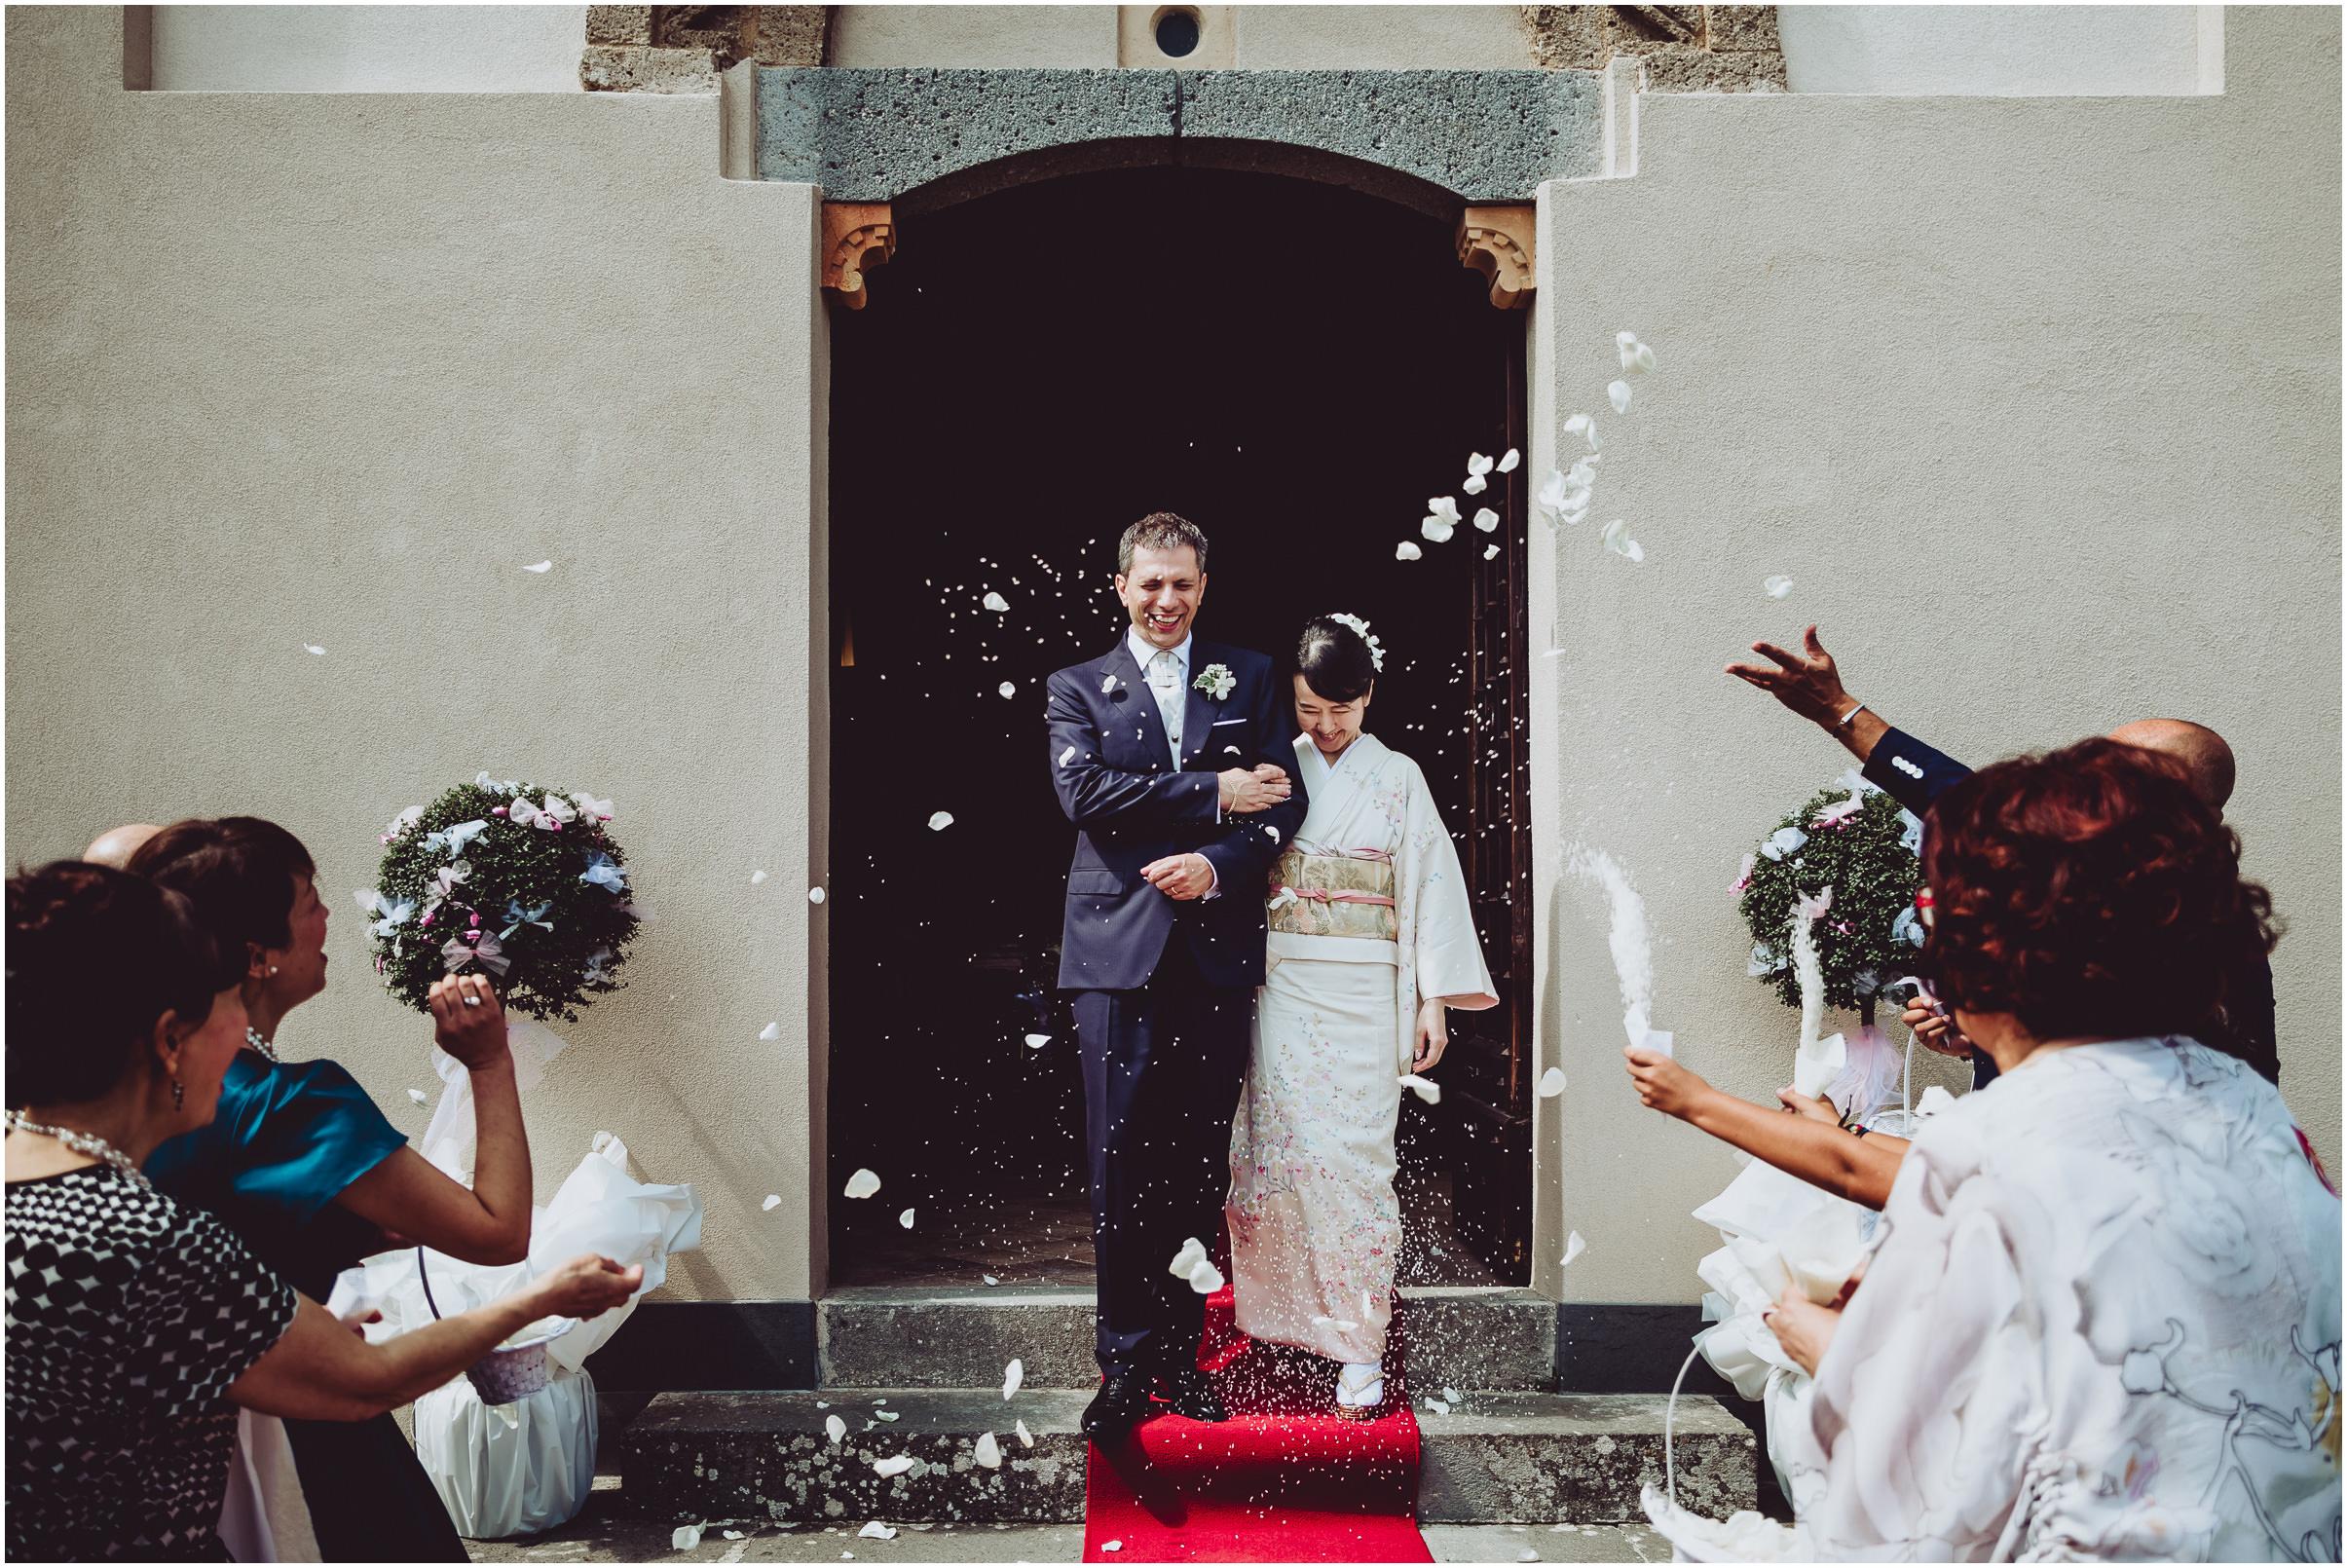 WEDDING-PHOTOGRAPHY-SARA-LORENZONI-FOTOGRAFIA-MATRIMONIO-ORVIETO-JUKA-ANTONELLO25